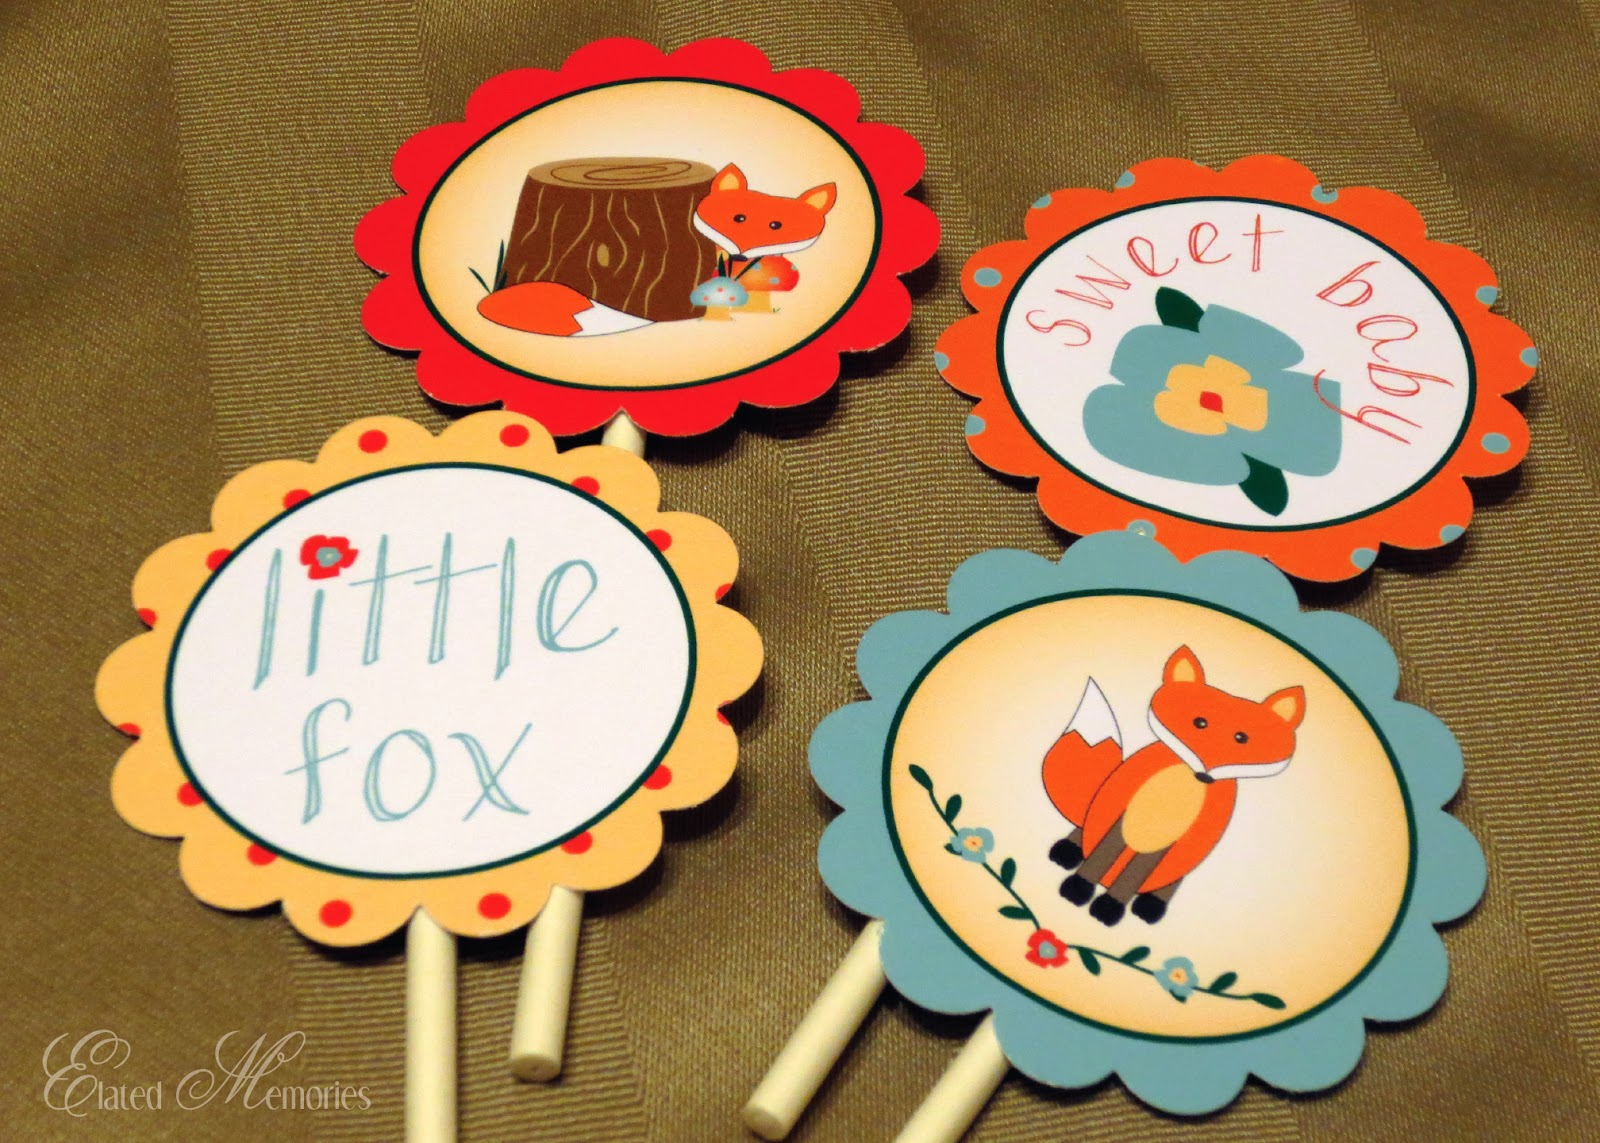 Elated Memories: A Design Blog: Little Fox {Color Challenge}